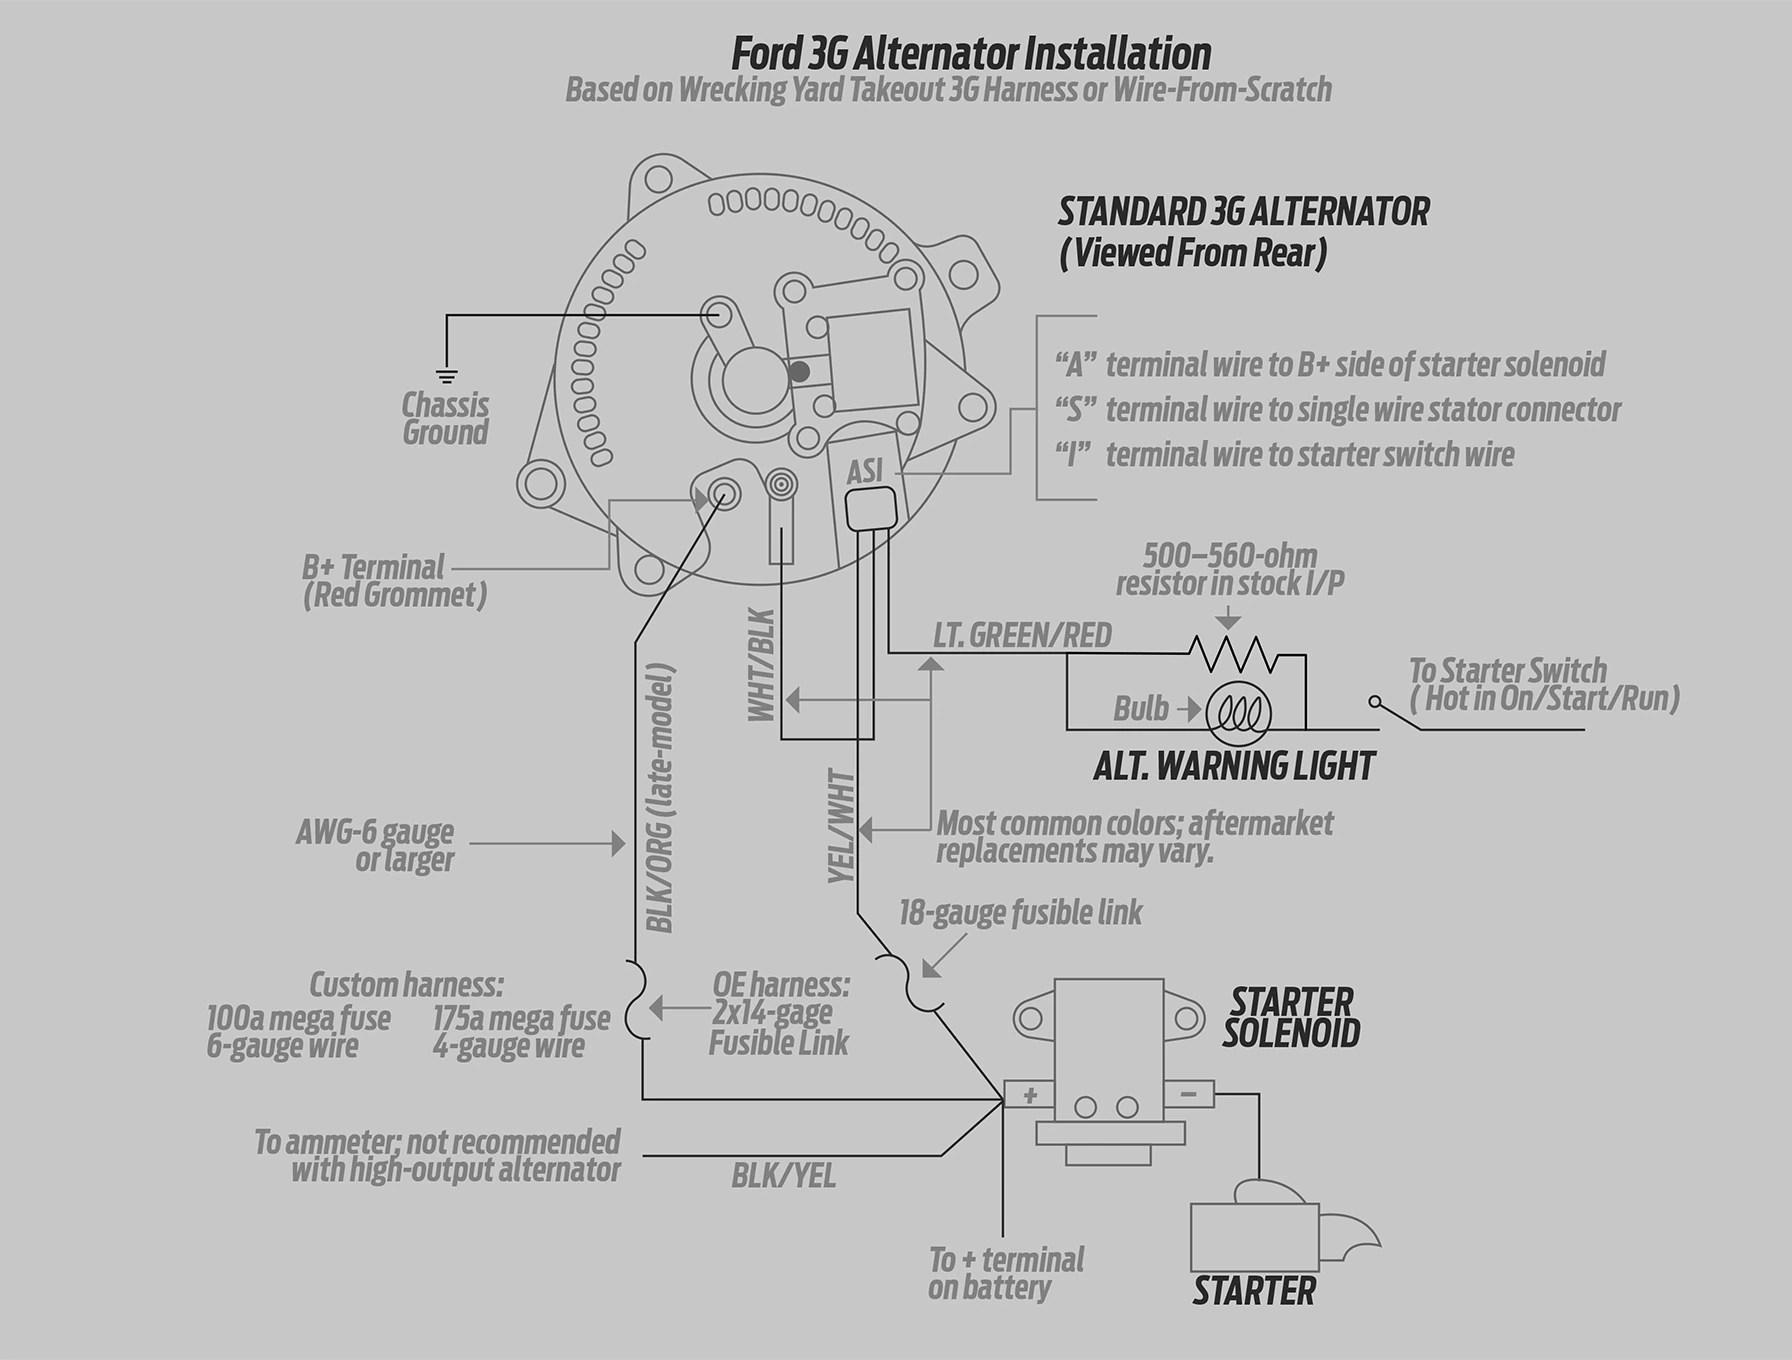 small resolution of ford 3g alternator wiring harness wiring diagram toolboxford 3g alternator wiring wiring diagram details ford 3g